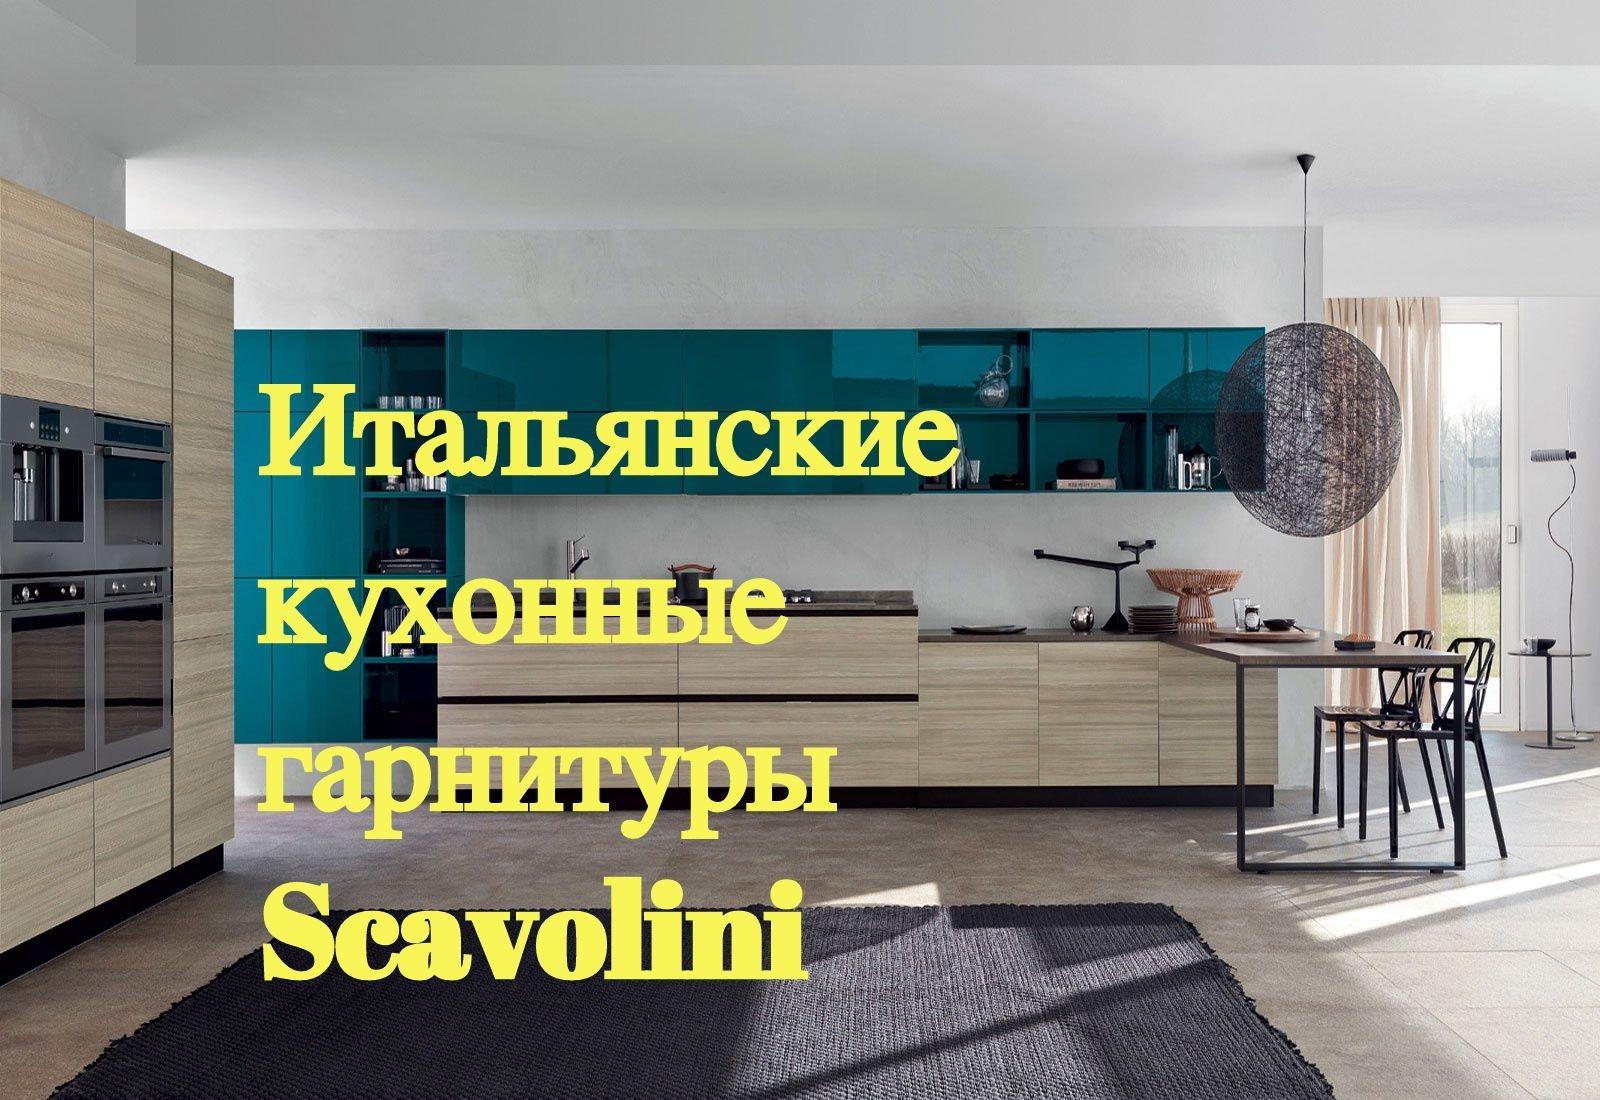 Кухонный гарнитур бежевого цвета. Шкафы из стекла.